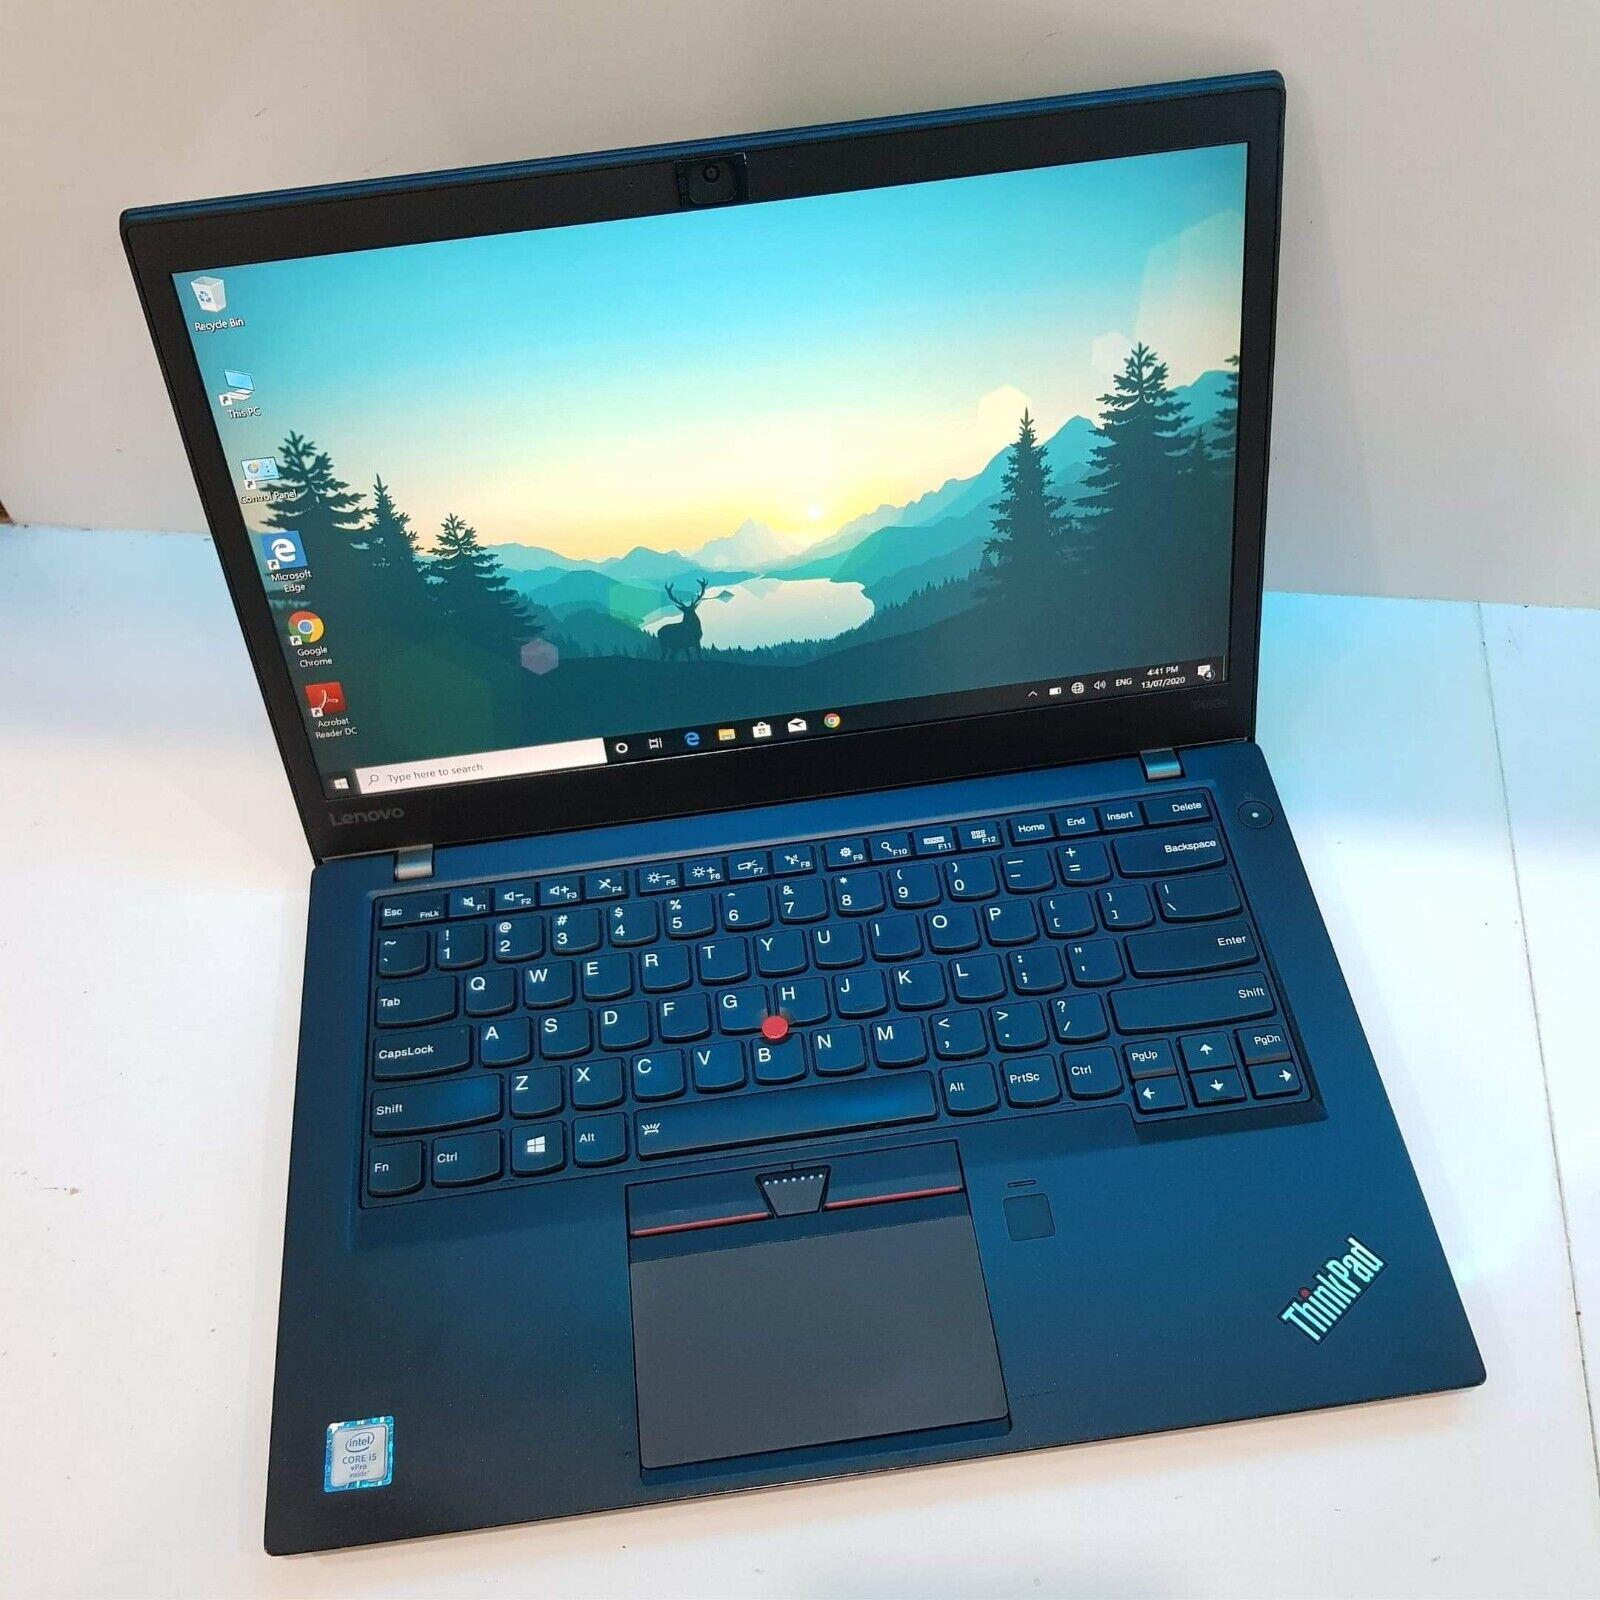 "Laptop Windows - Lenovo ThinkPad T460s 14"" Core i5-6300U 8GB RAM 256GB SSD 2.50GHz windows 10Pro"